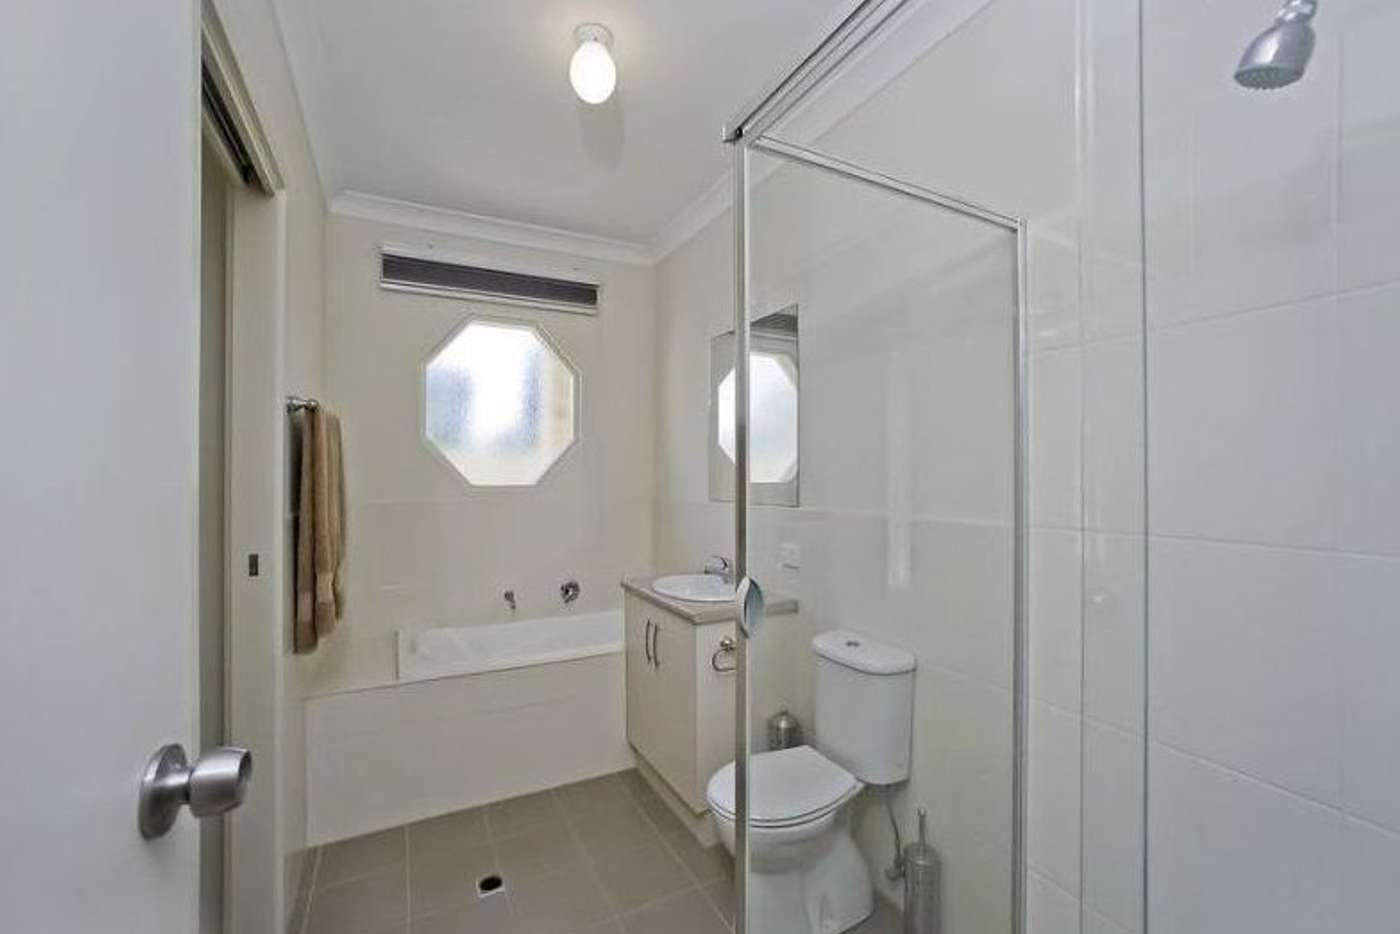 Sixth view of Homely house listing, 12 Workman Street, Birkenhead SA 5015